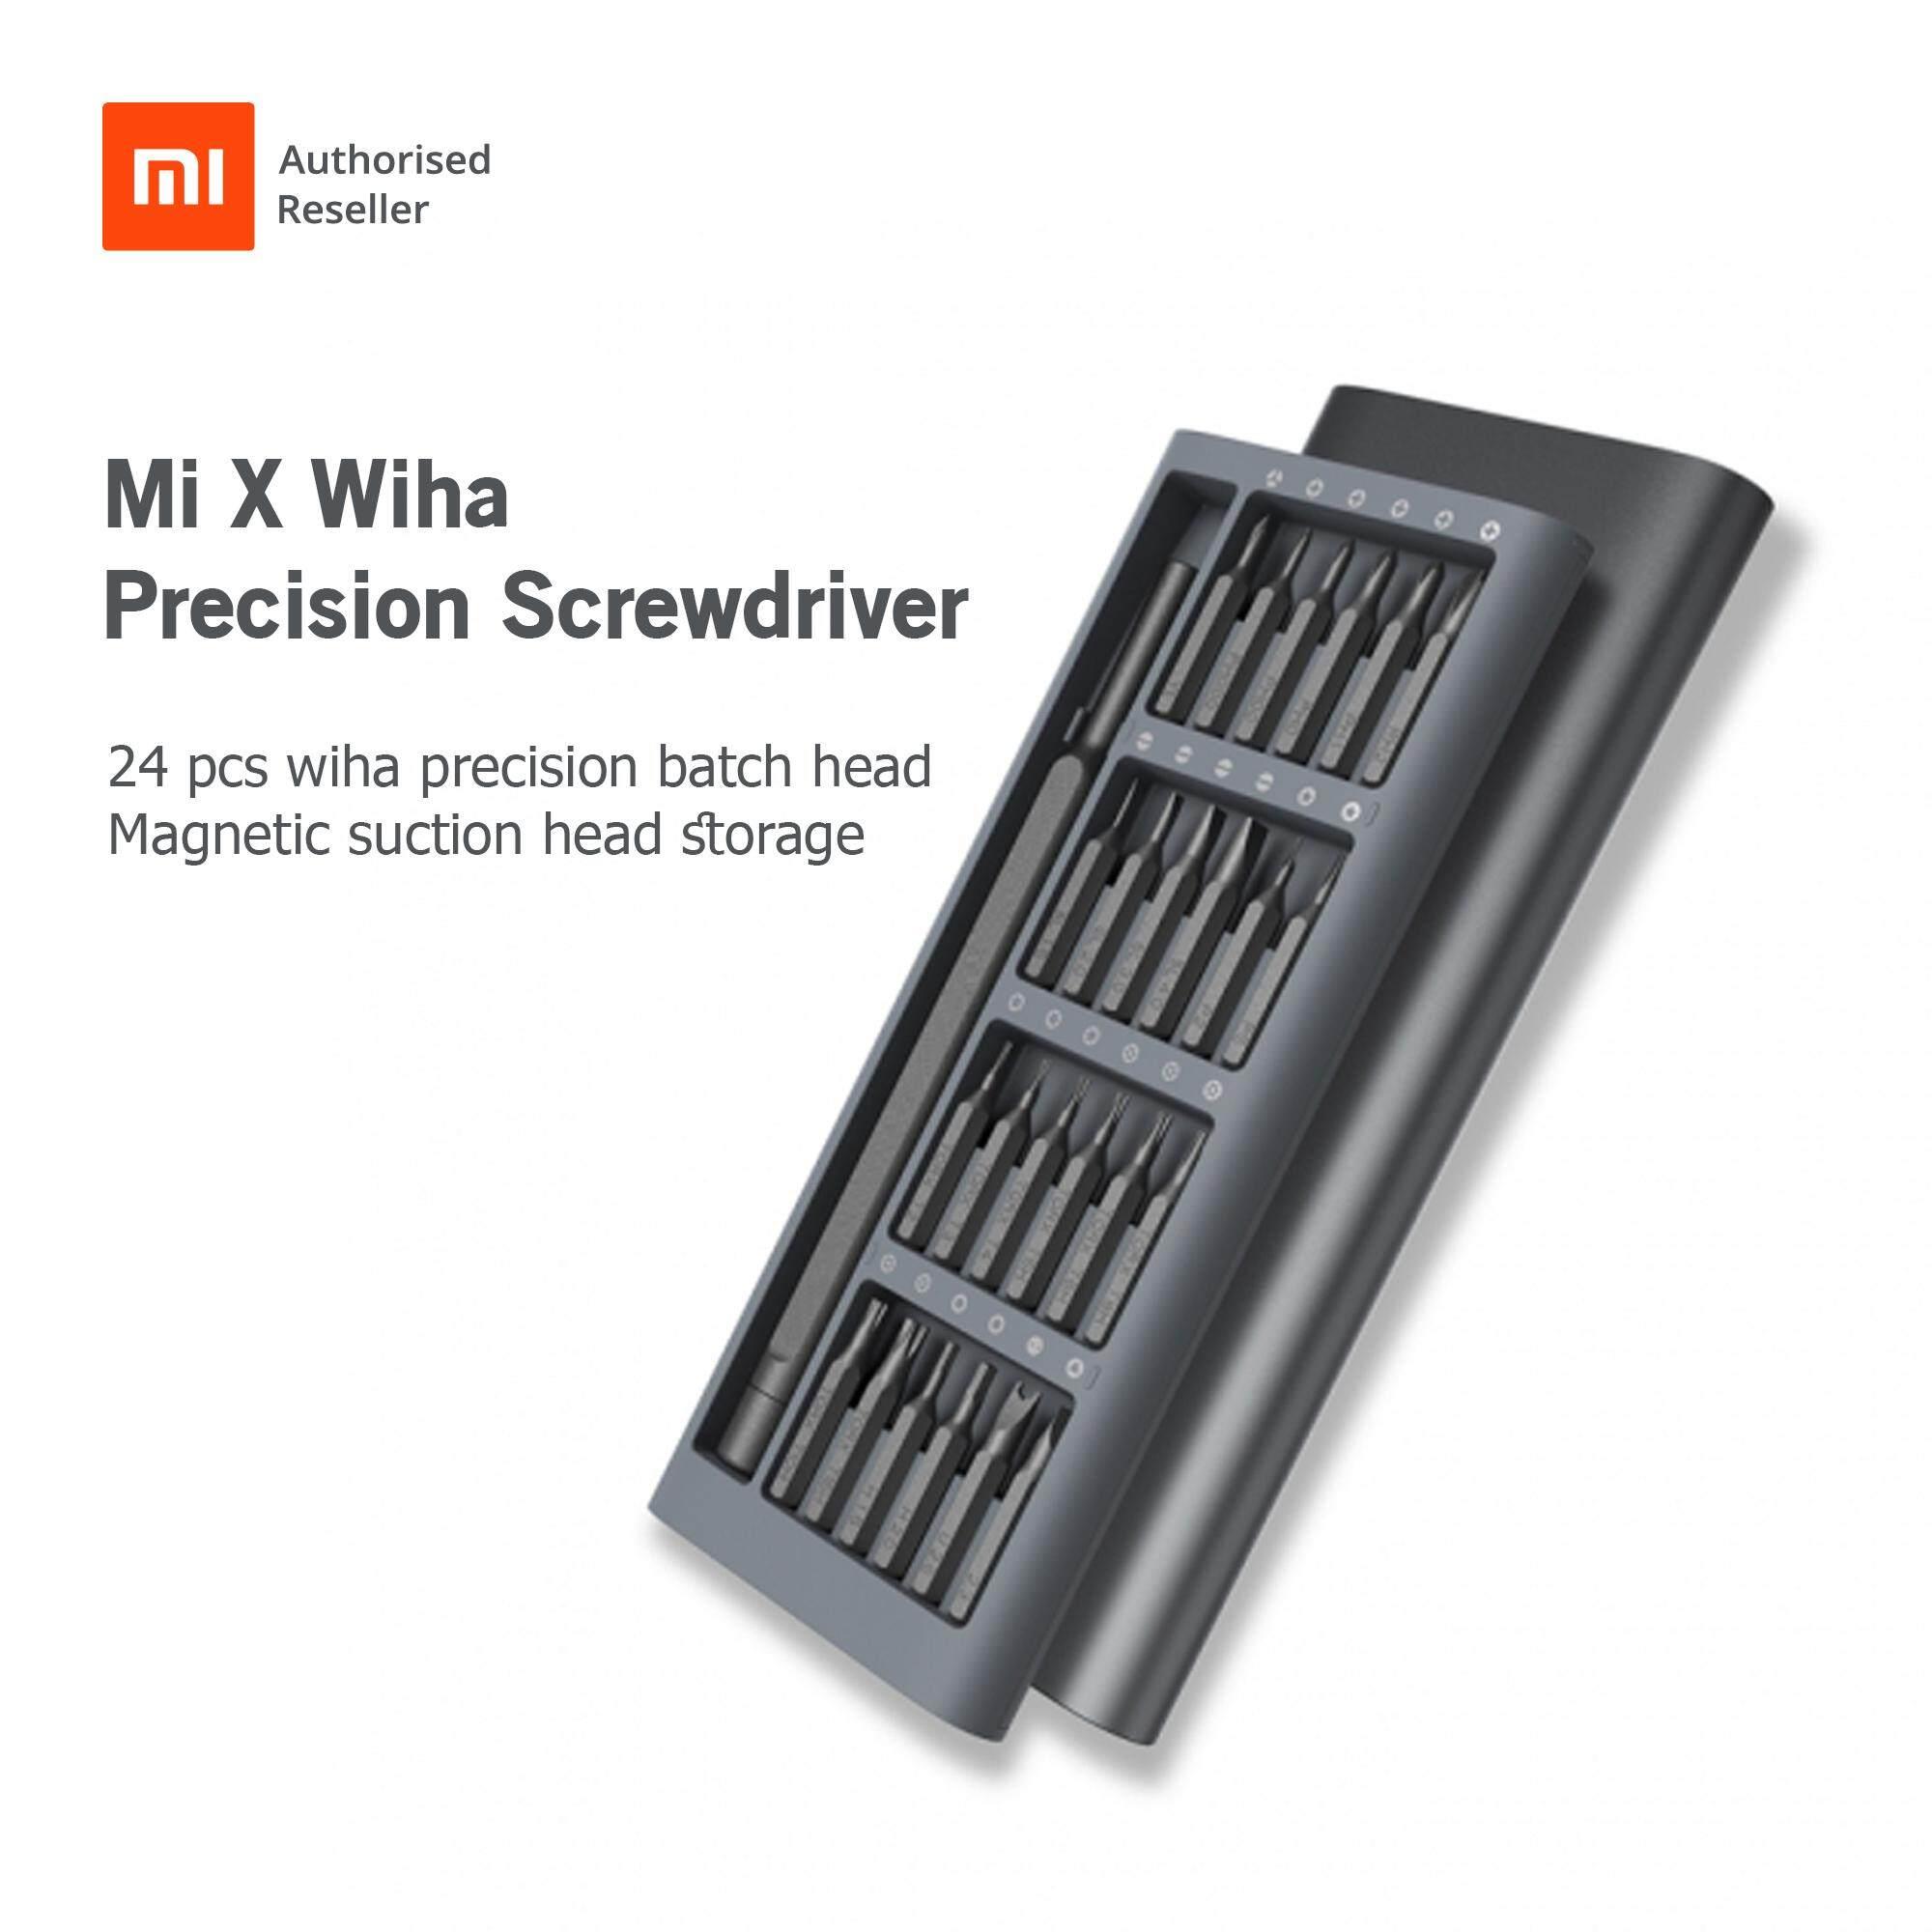 Mi X Wiha Precision Screwdriver